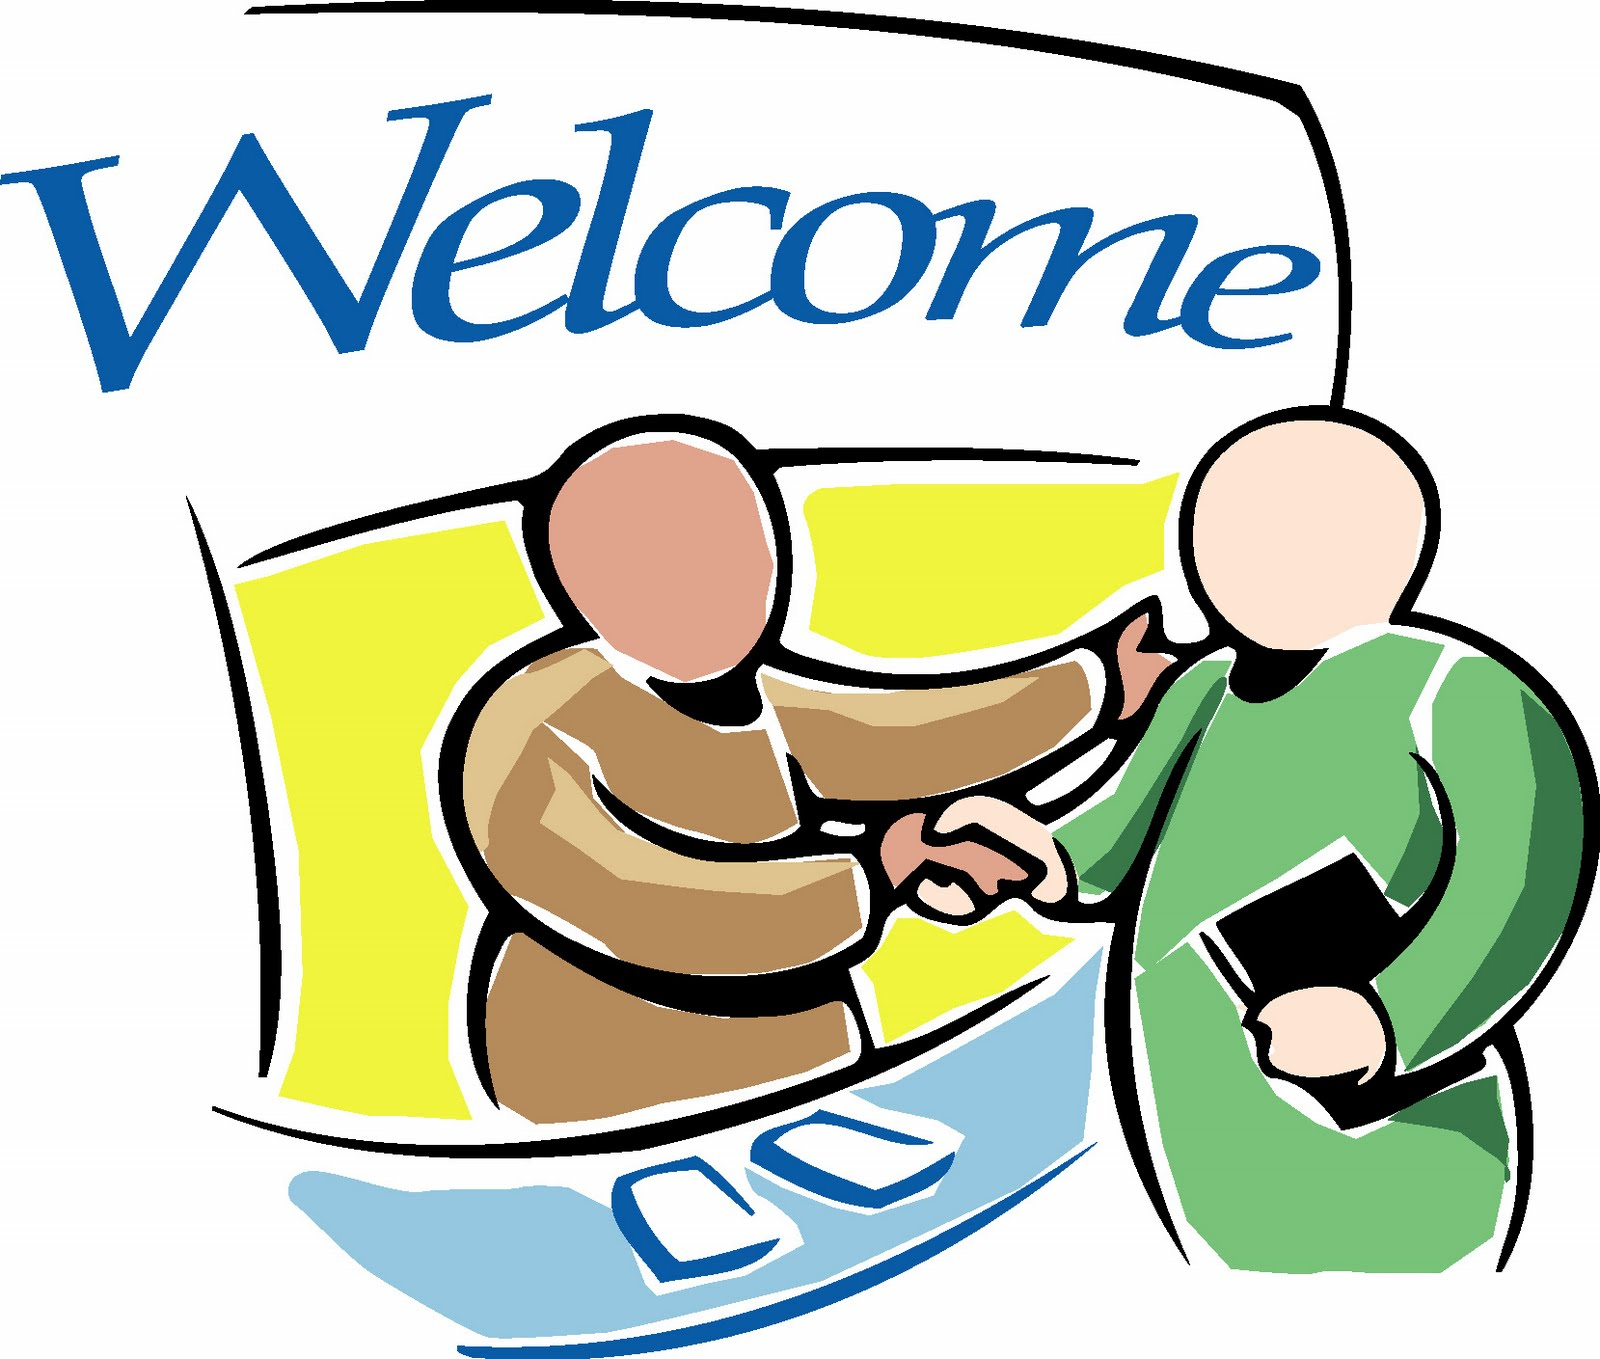 Welcome church visitors clipart clip art Visitor Clipart | Free download best Visitor Clipart on ... clip art